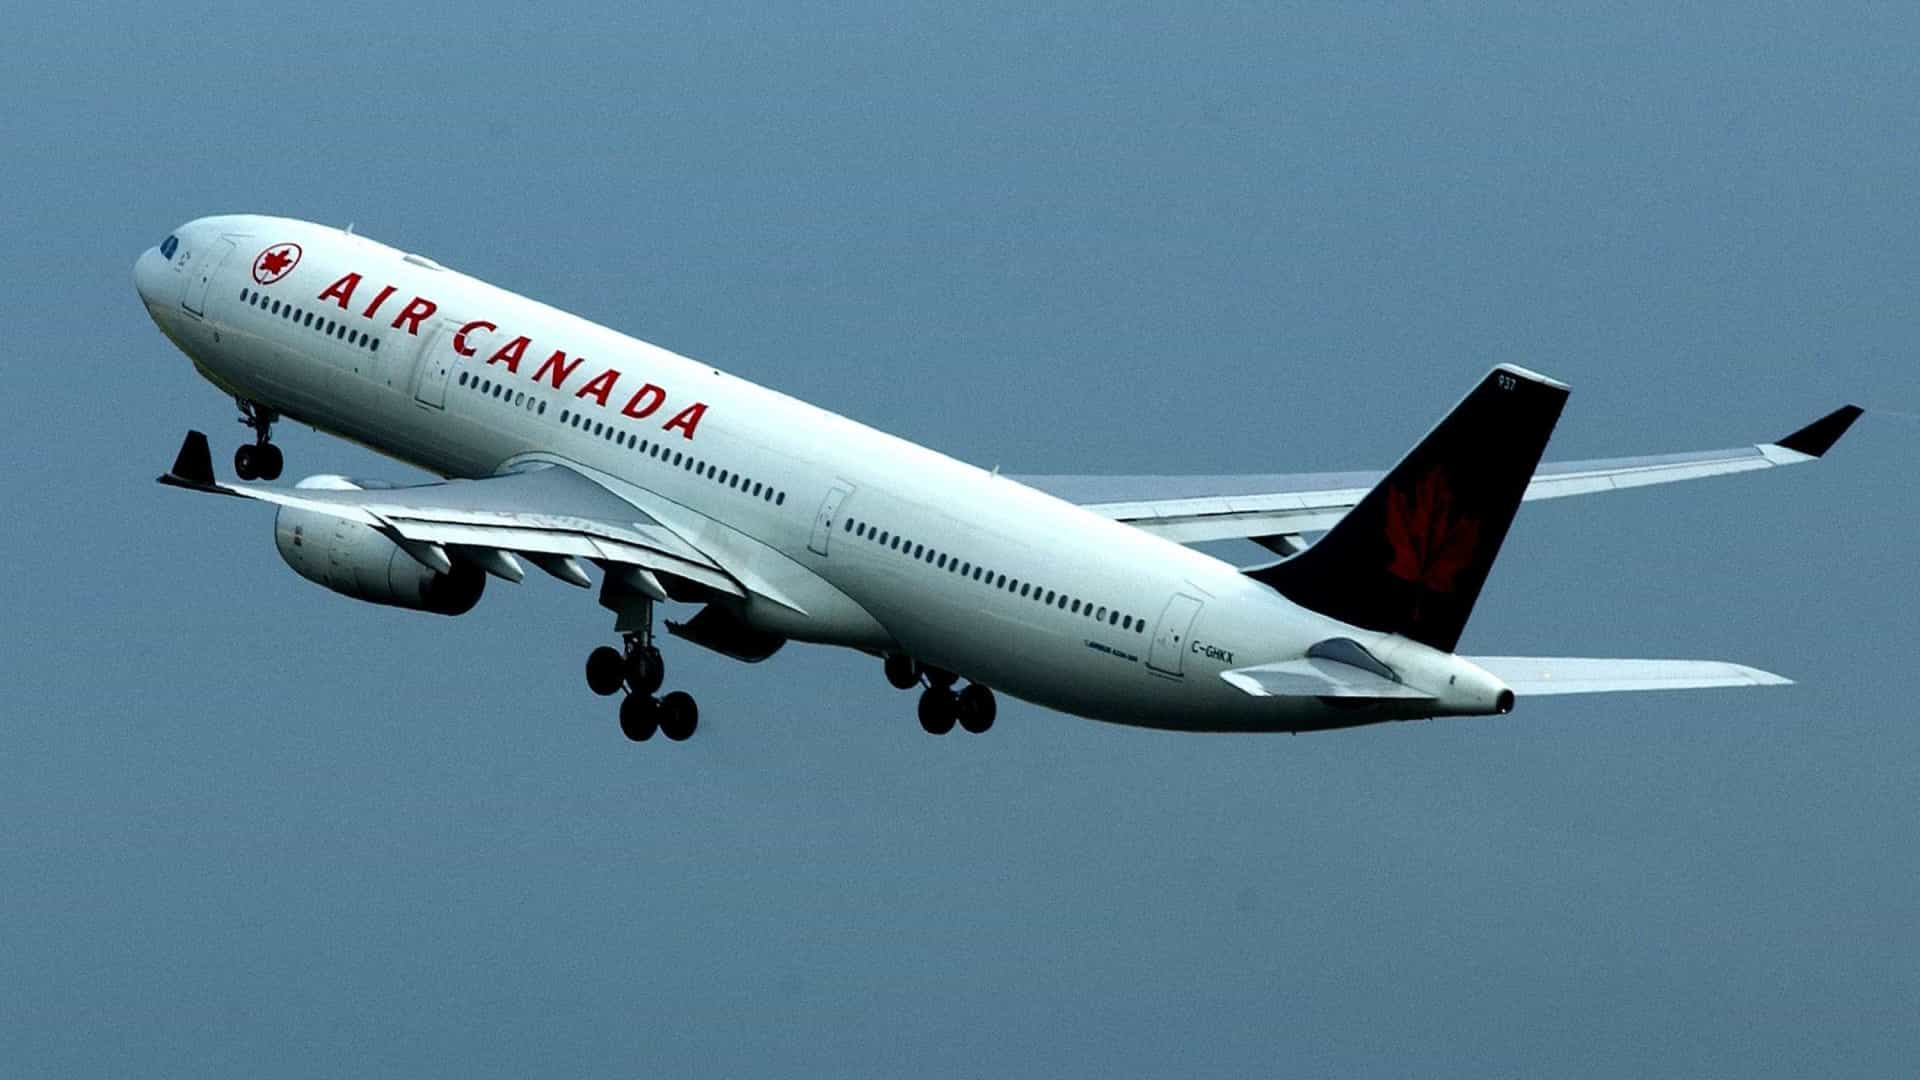 Air Canada vai ligar Lisboa e Porto a Montreal e Toronto a partir de 2018